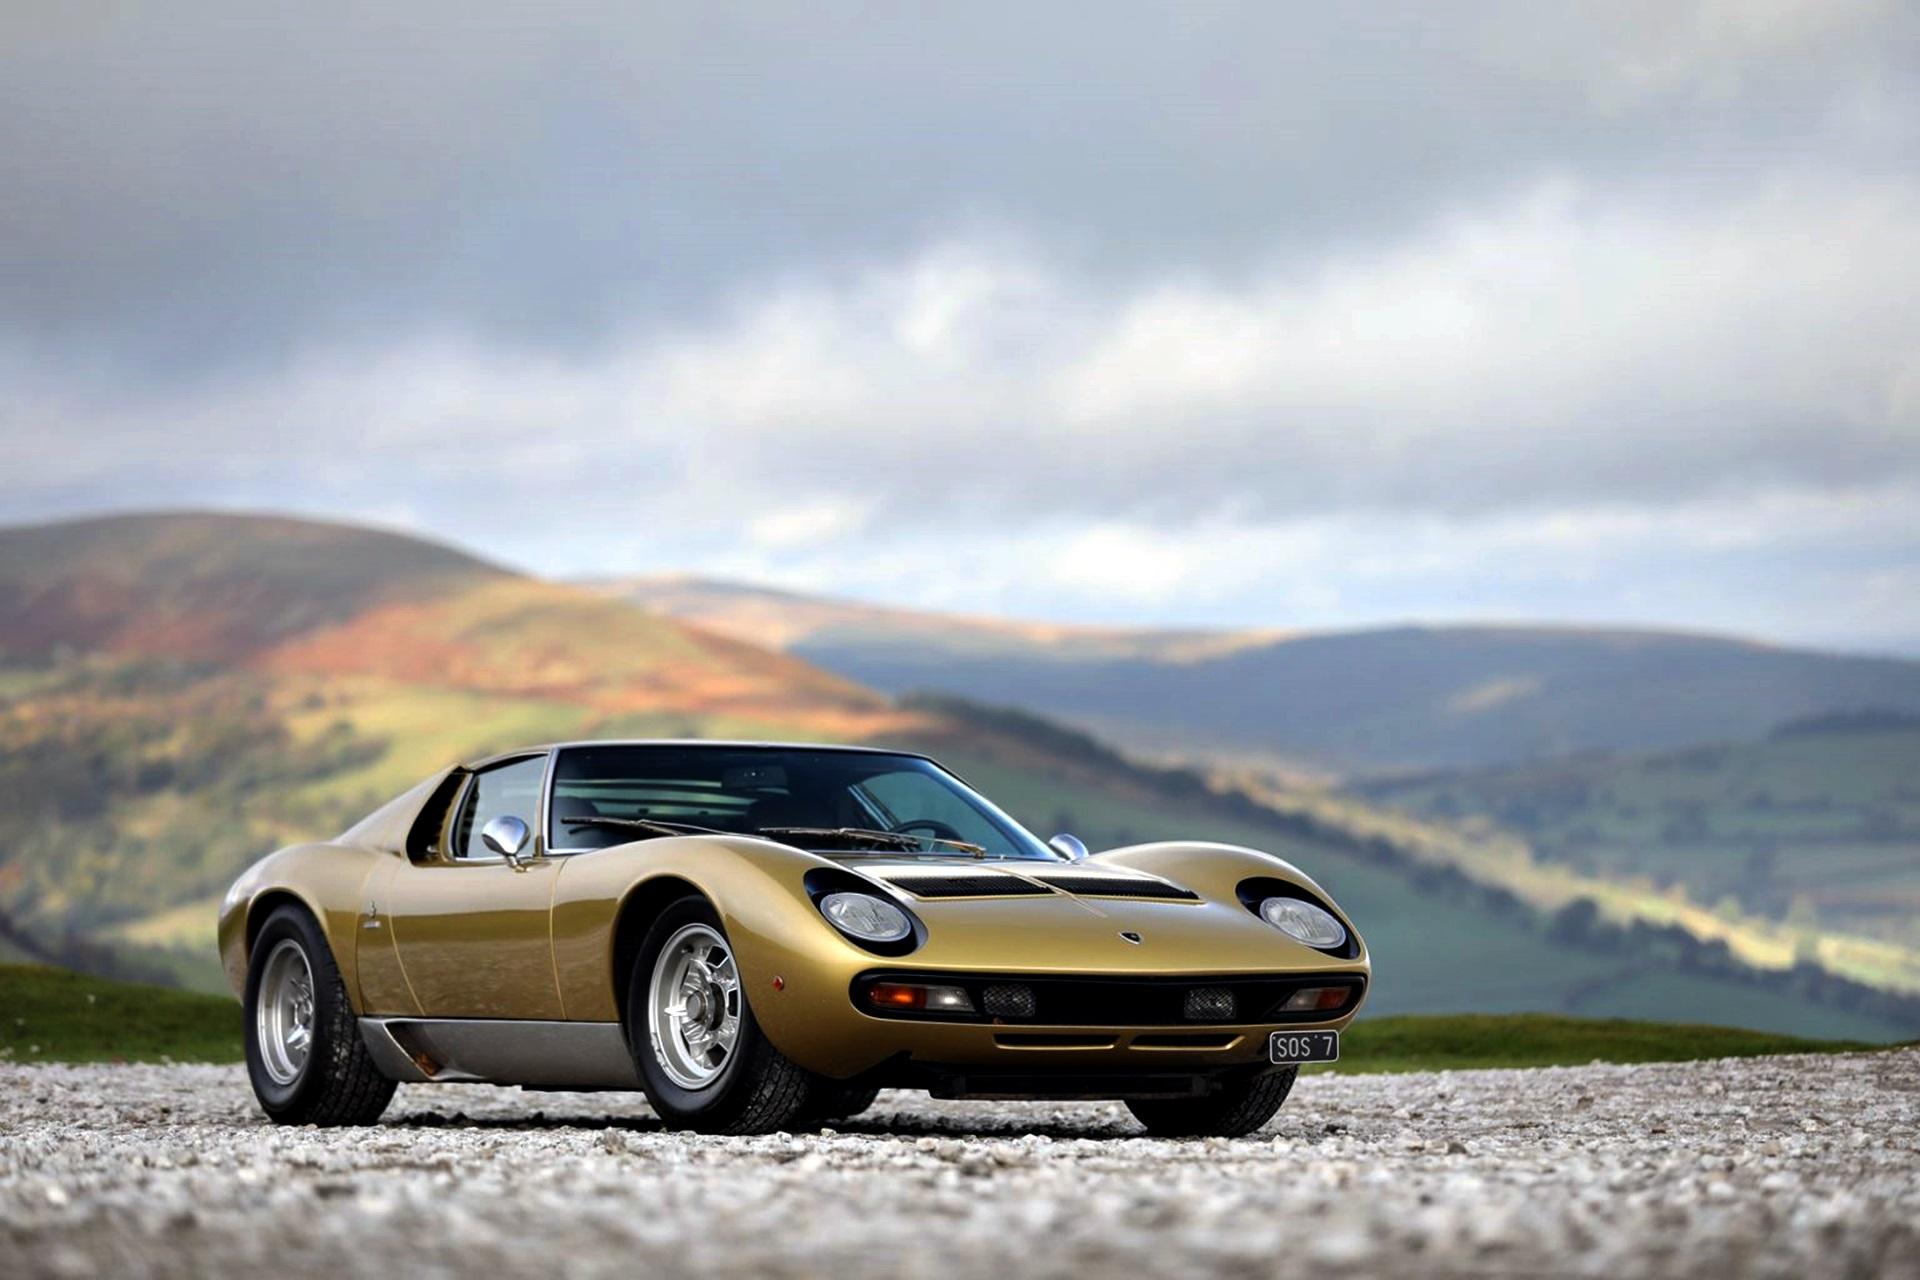 Lamborghini Miura SV celebra 50 anos